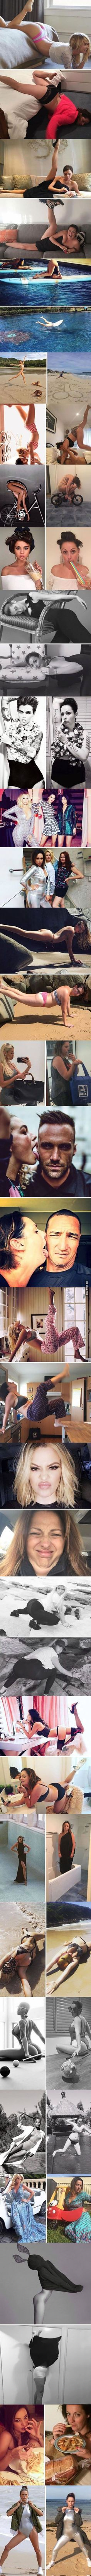 Woman reenacts celebrities photos